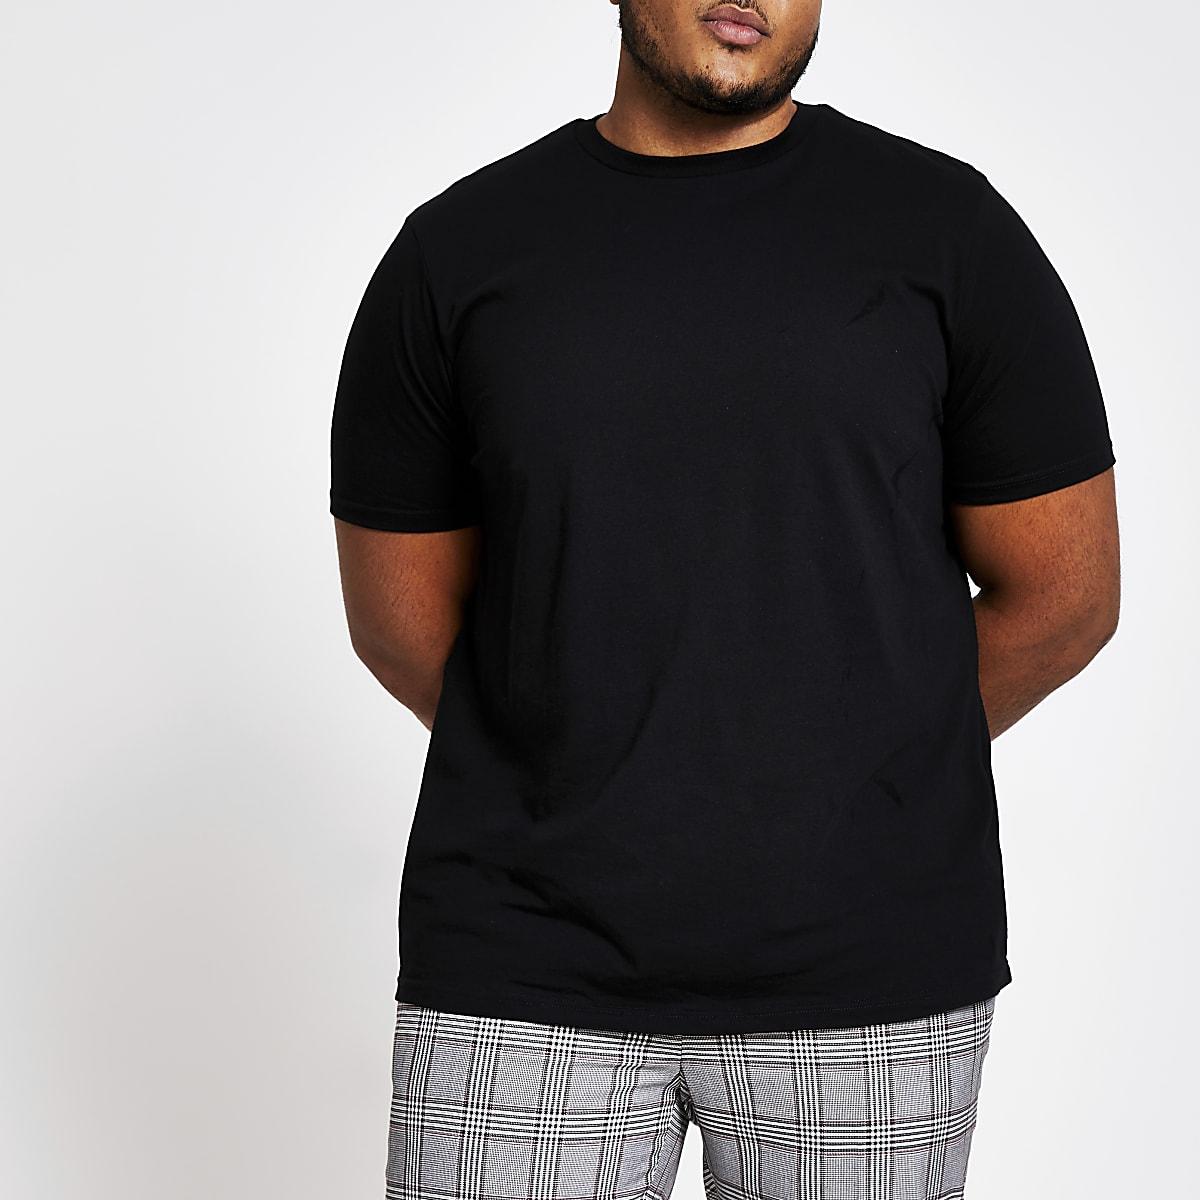 Big and Tall black short sleeve T-shirt